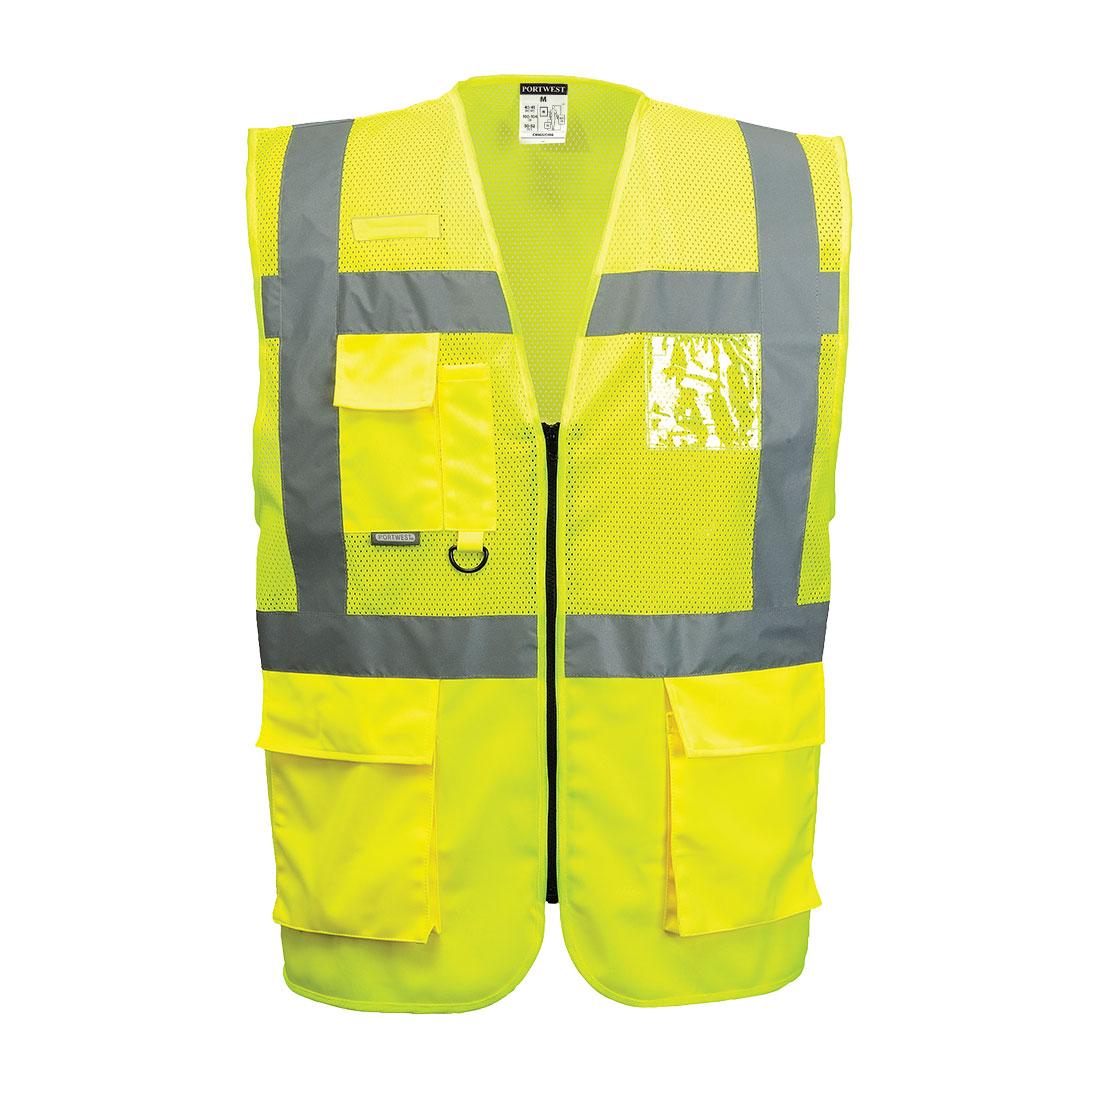 Madrid Executive Mesh Vest Yellow SR